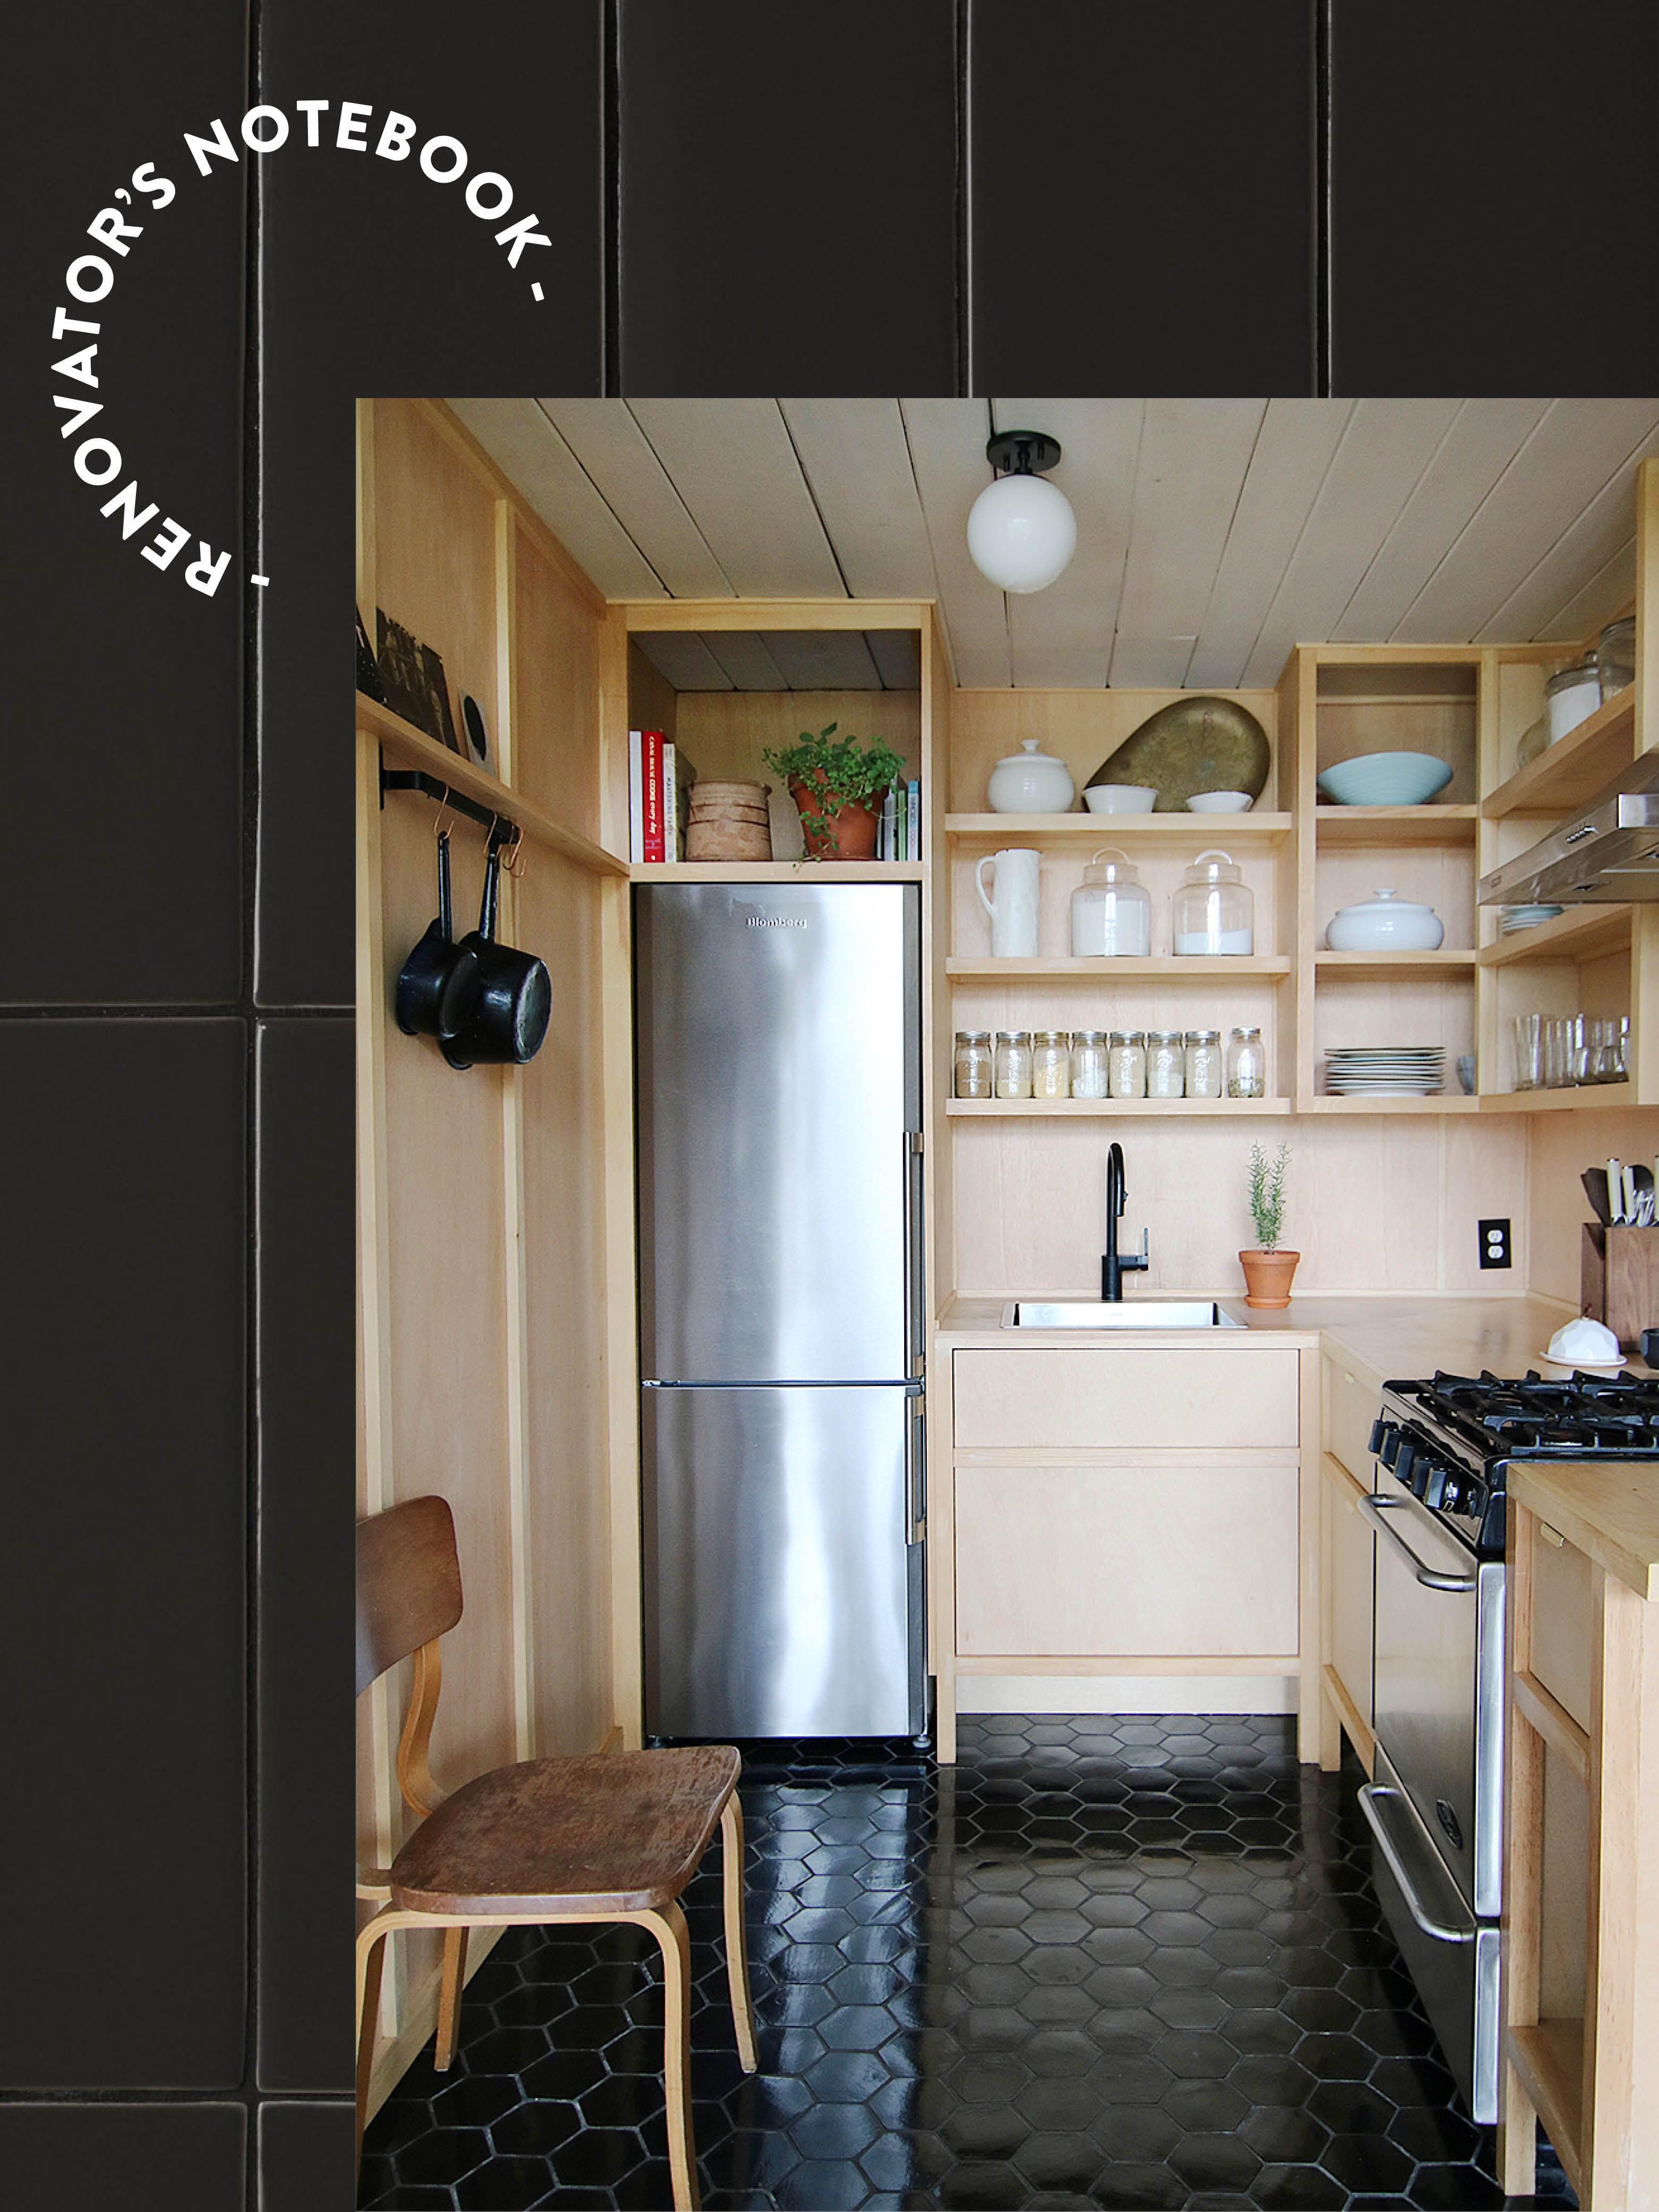 00-FEATURE-Megan-Pflug-Renovators-Notebook-domino-kitchen2